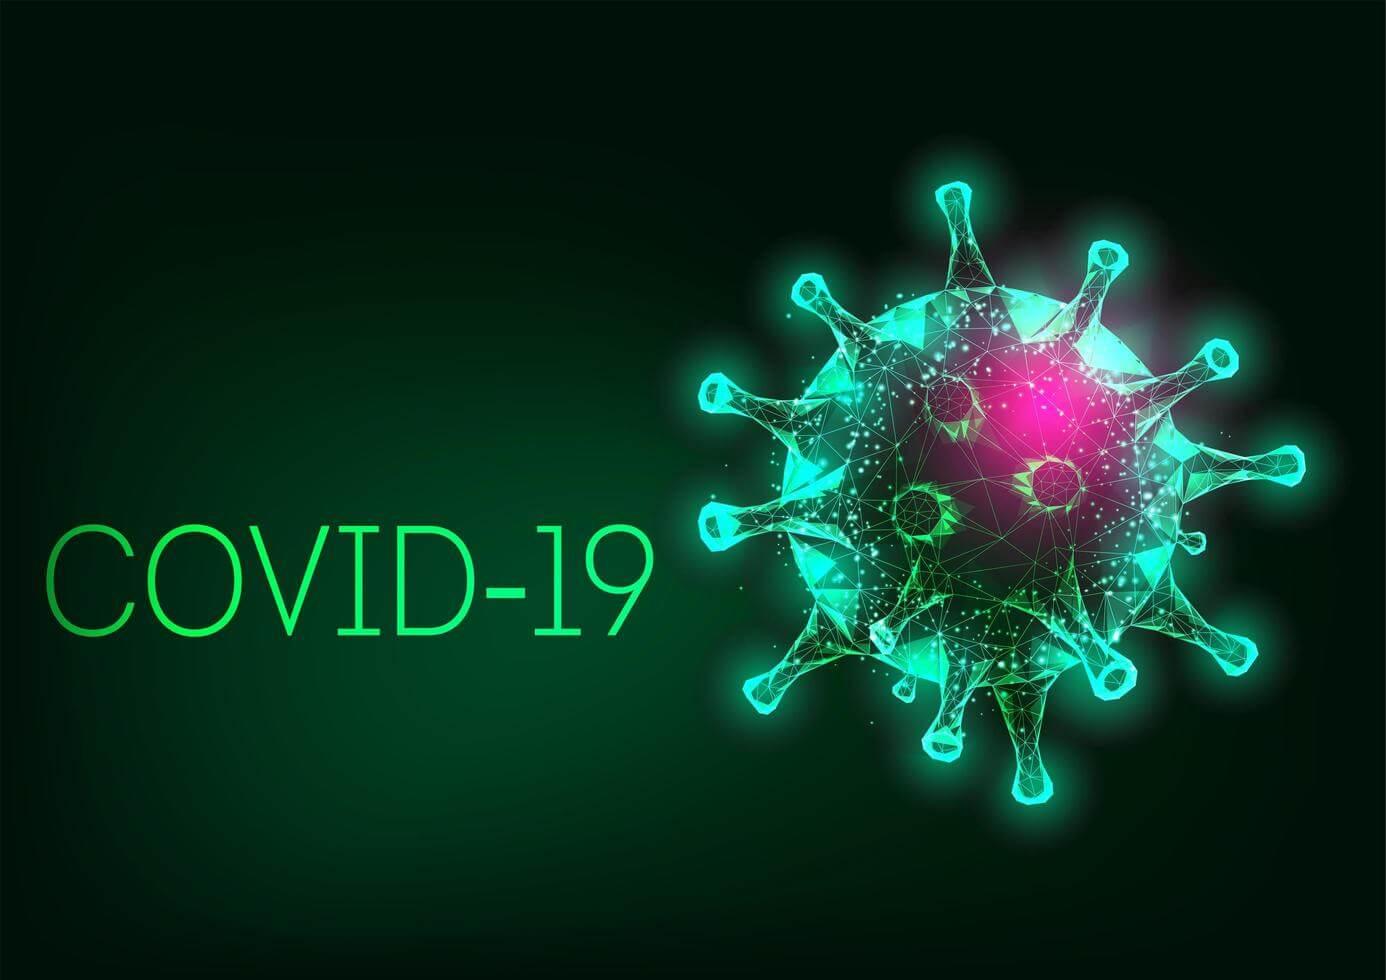 20937newcovid19infections104deathsinandhrapradesh